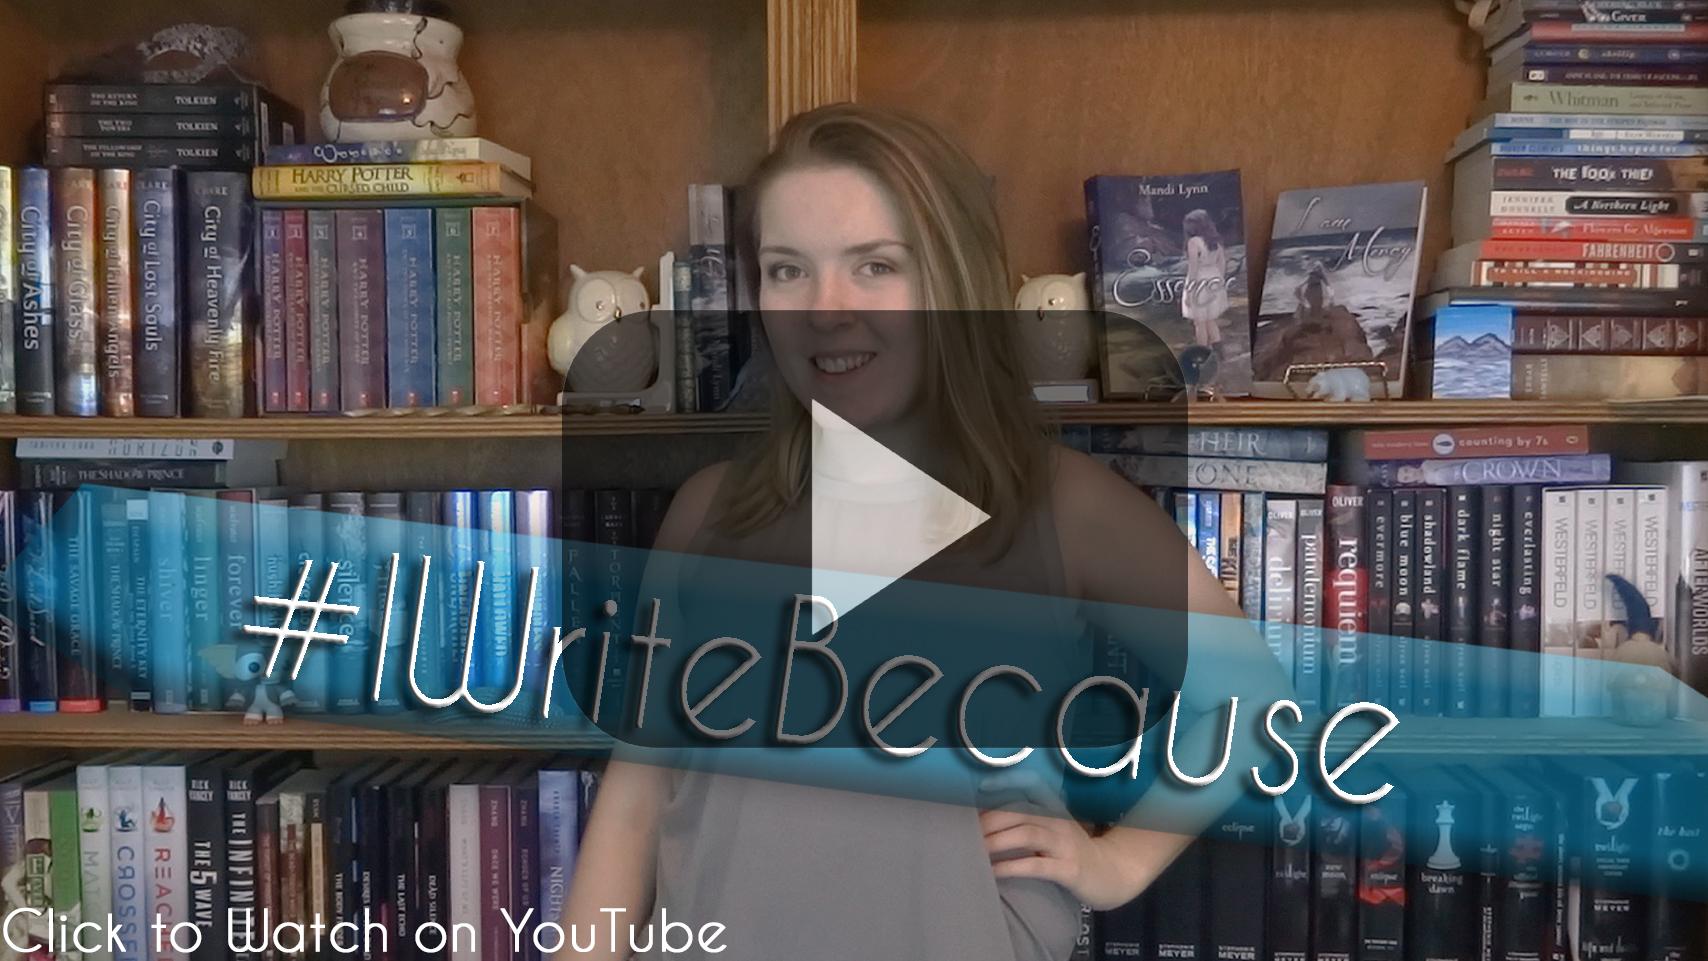 #IWriteBecause why do I write